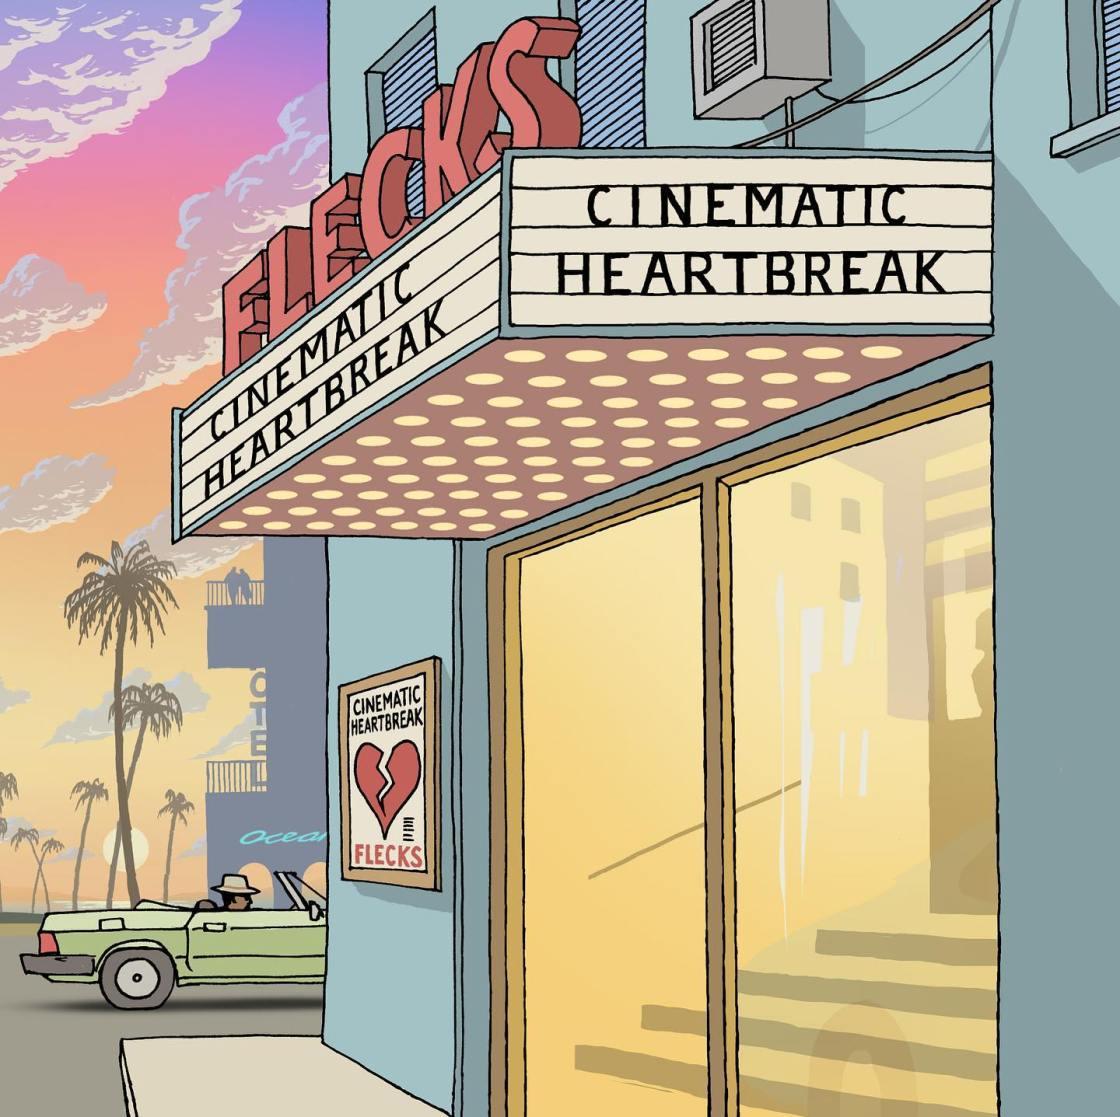 Flecks - Cinematic Heartbreak